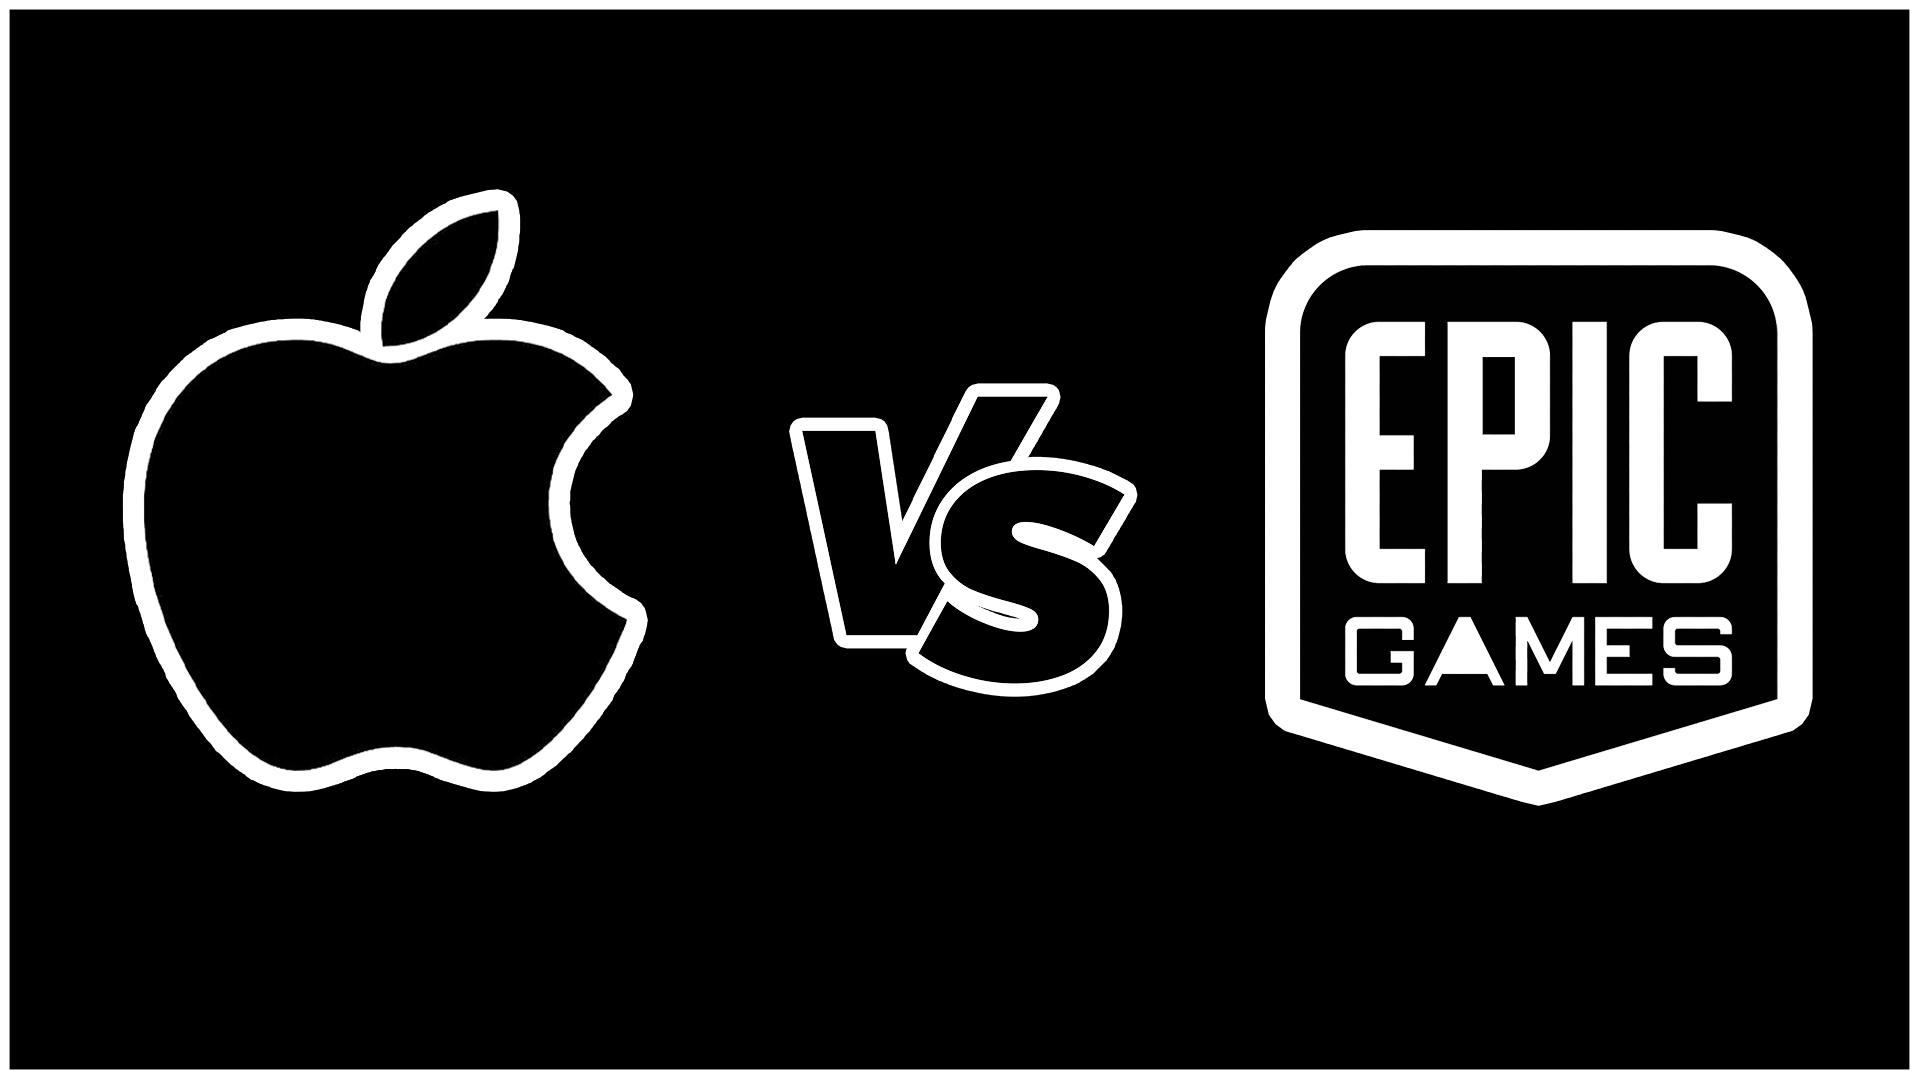 Apple V/s Epic